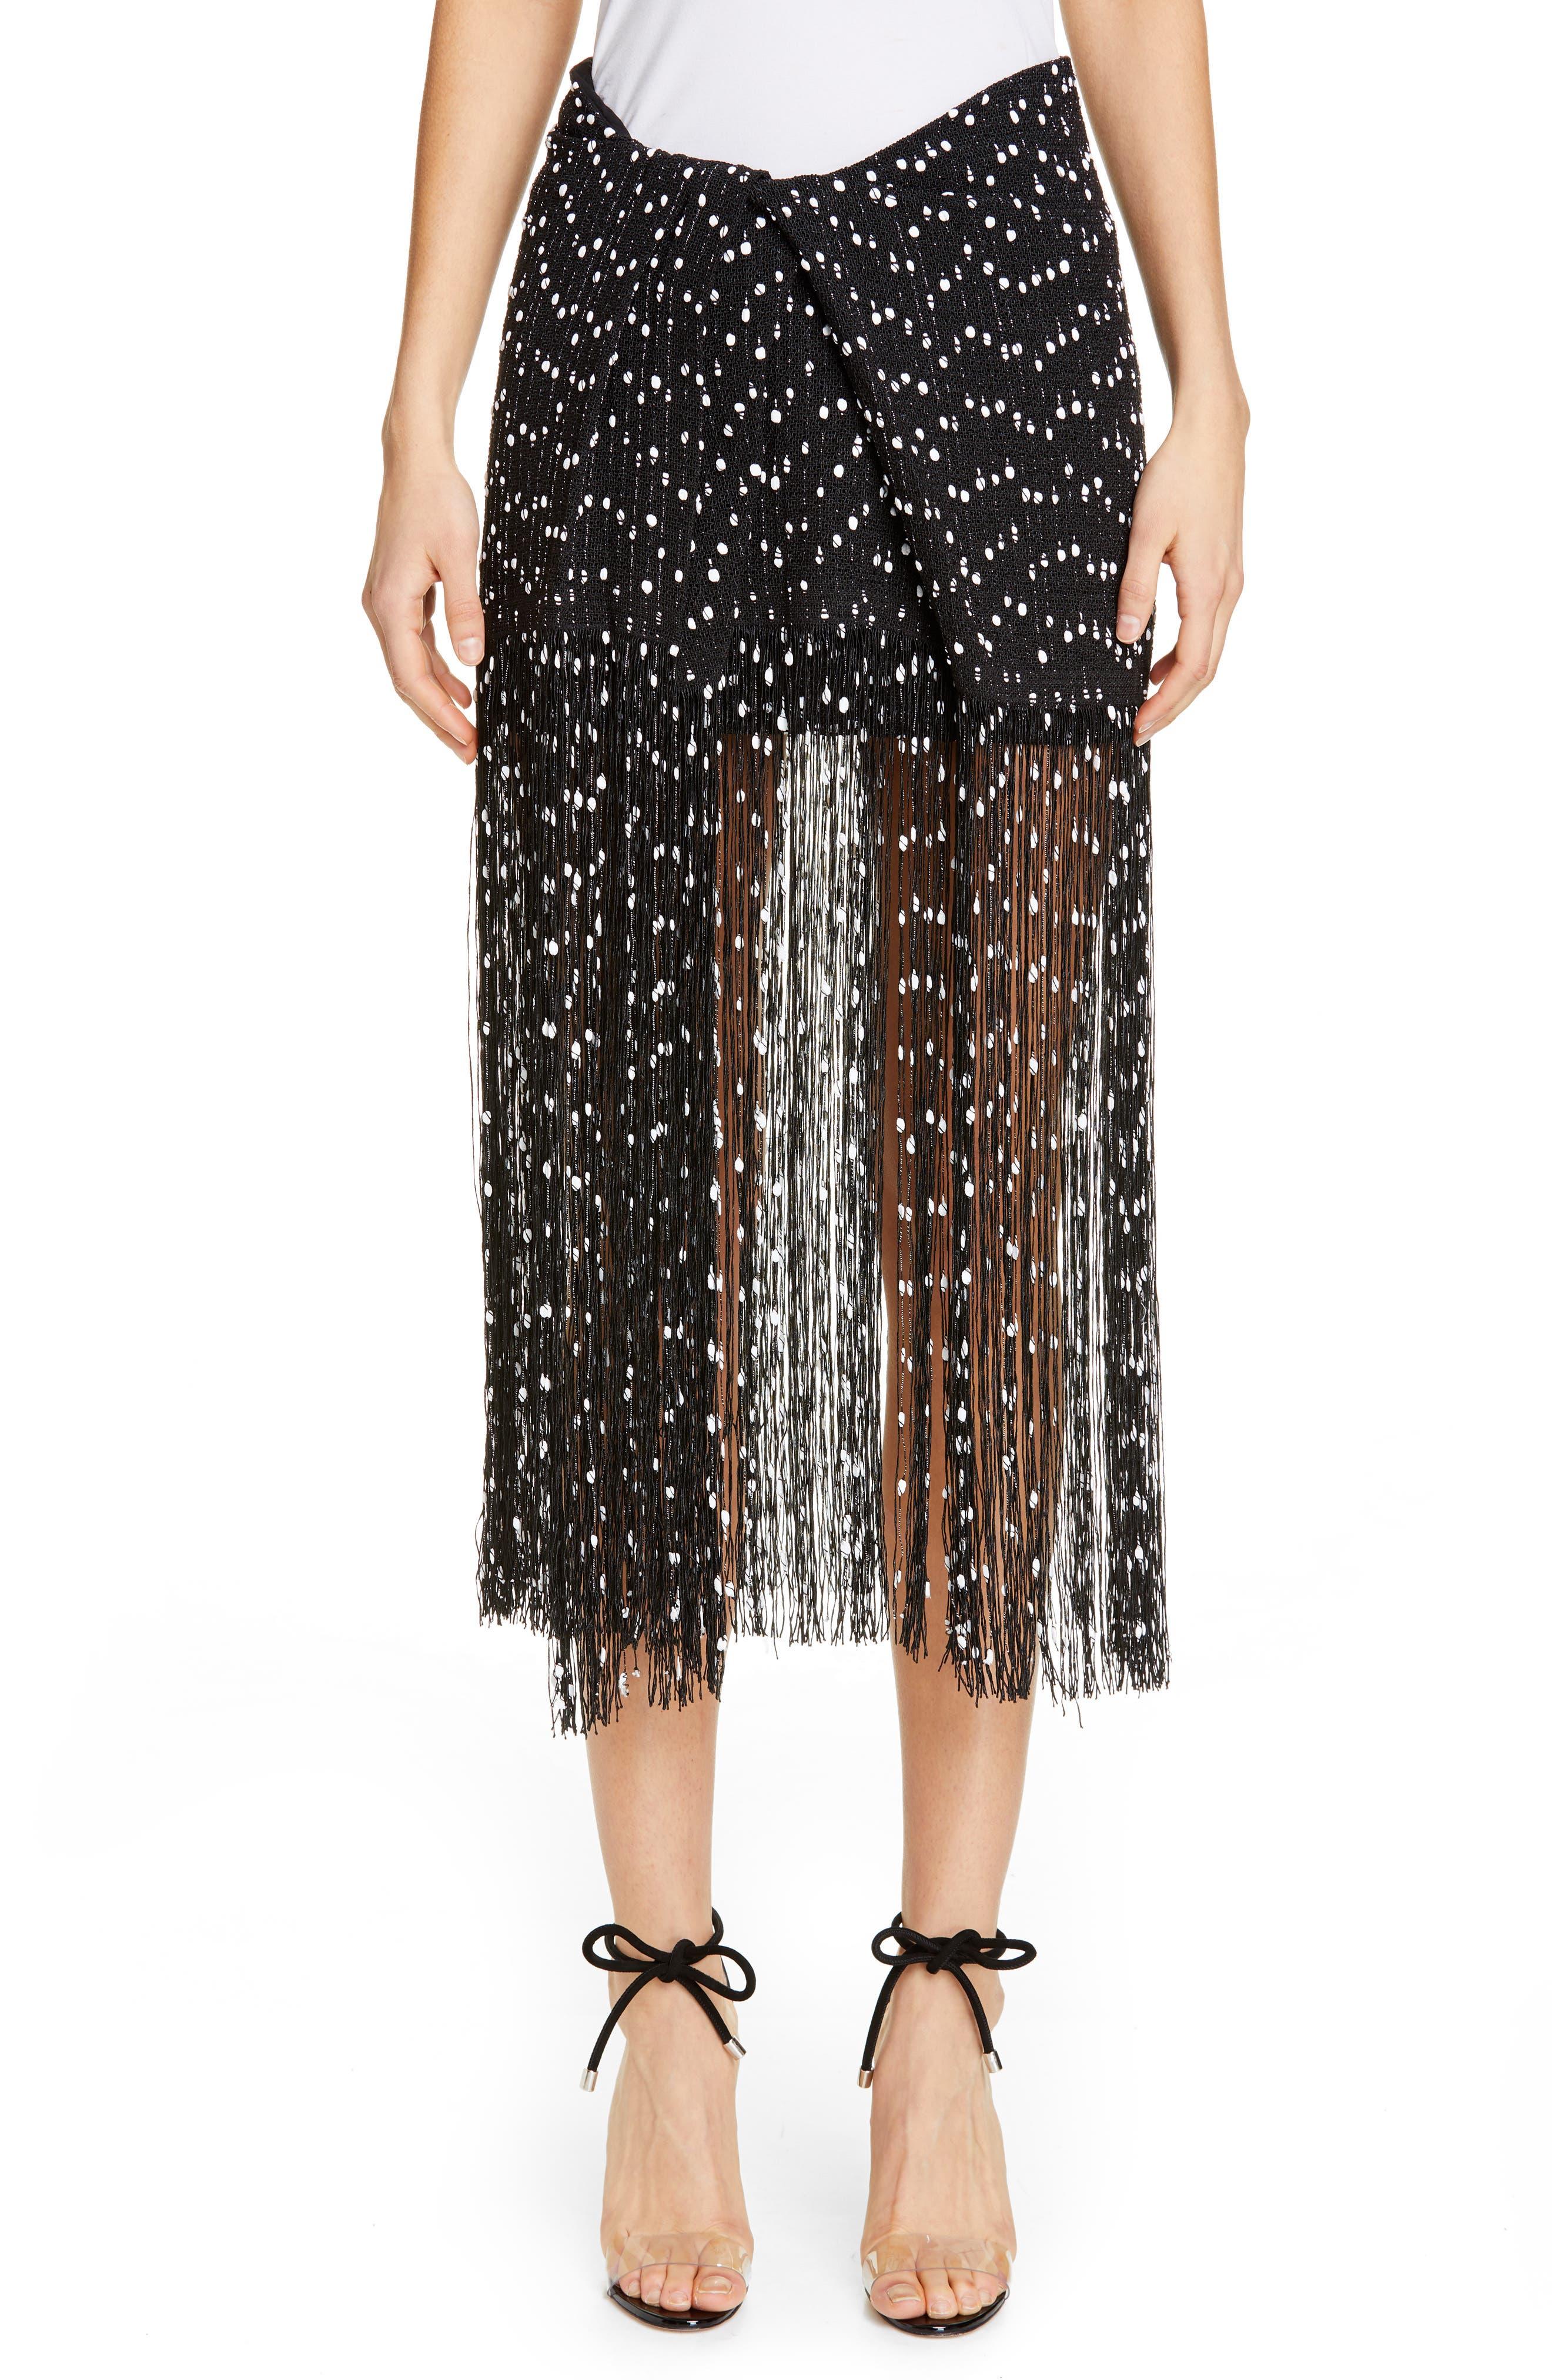 Jacquemus La Jupe Capri Fringe Skirt, 8 FR - Black